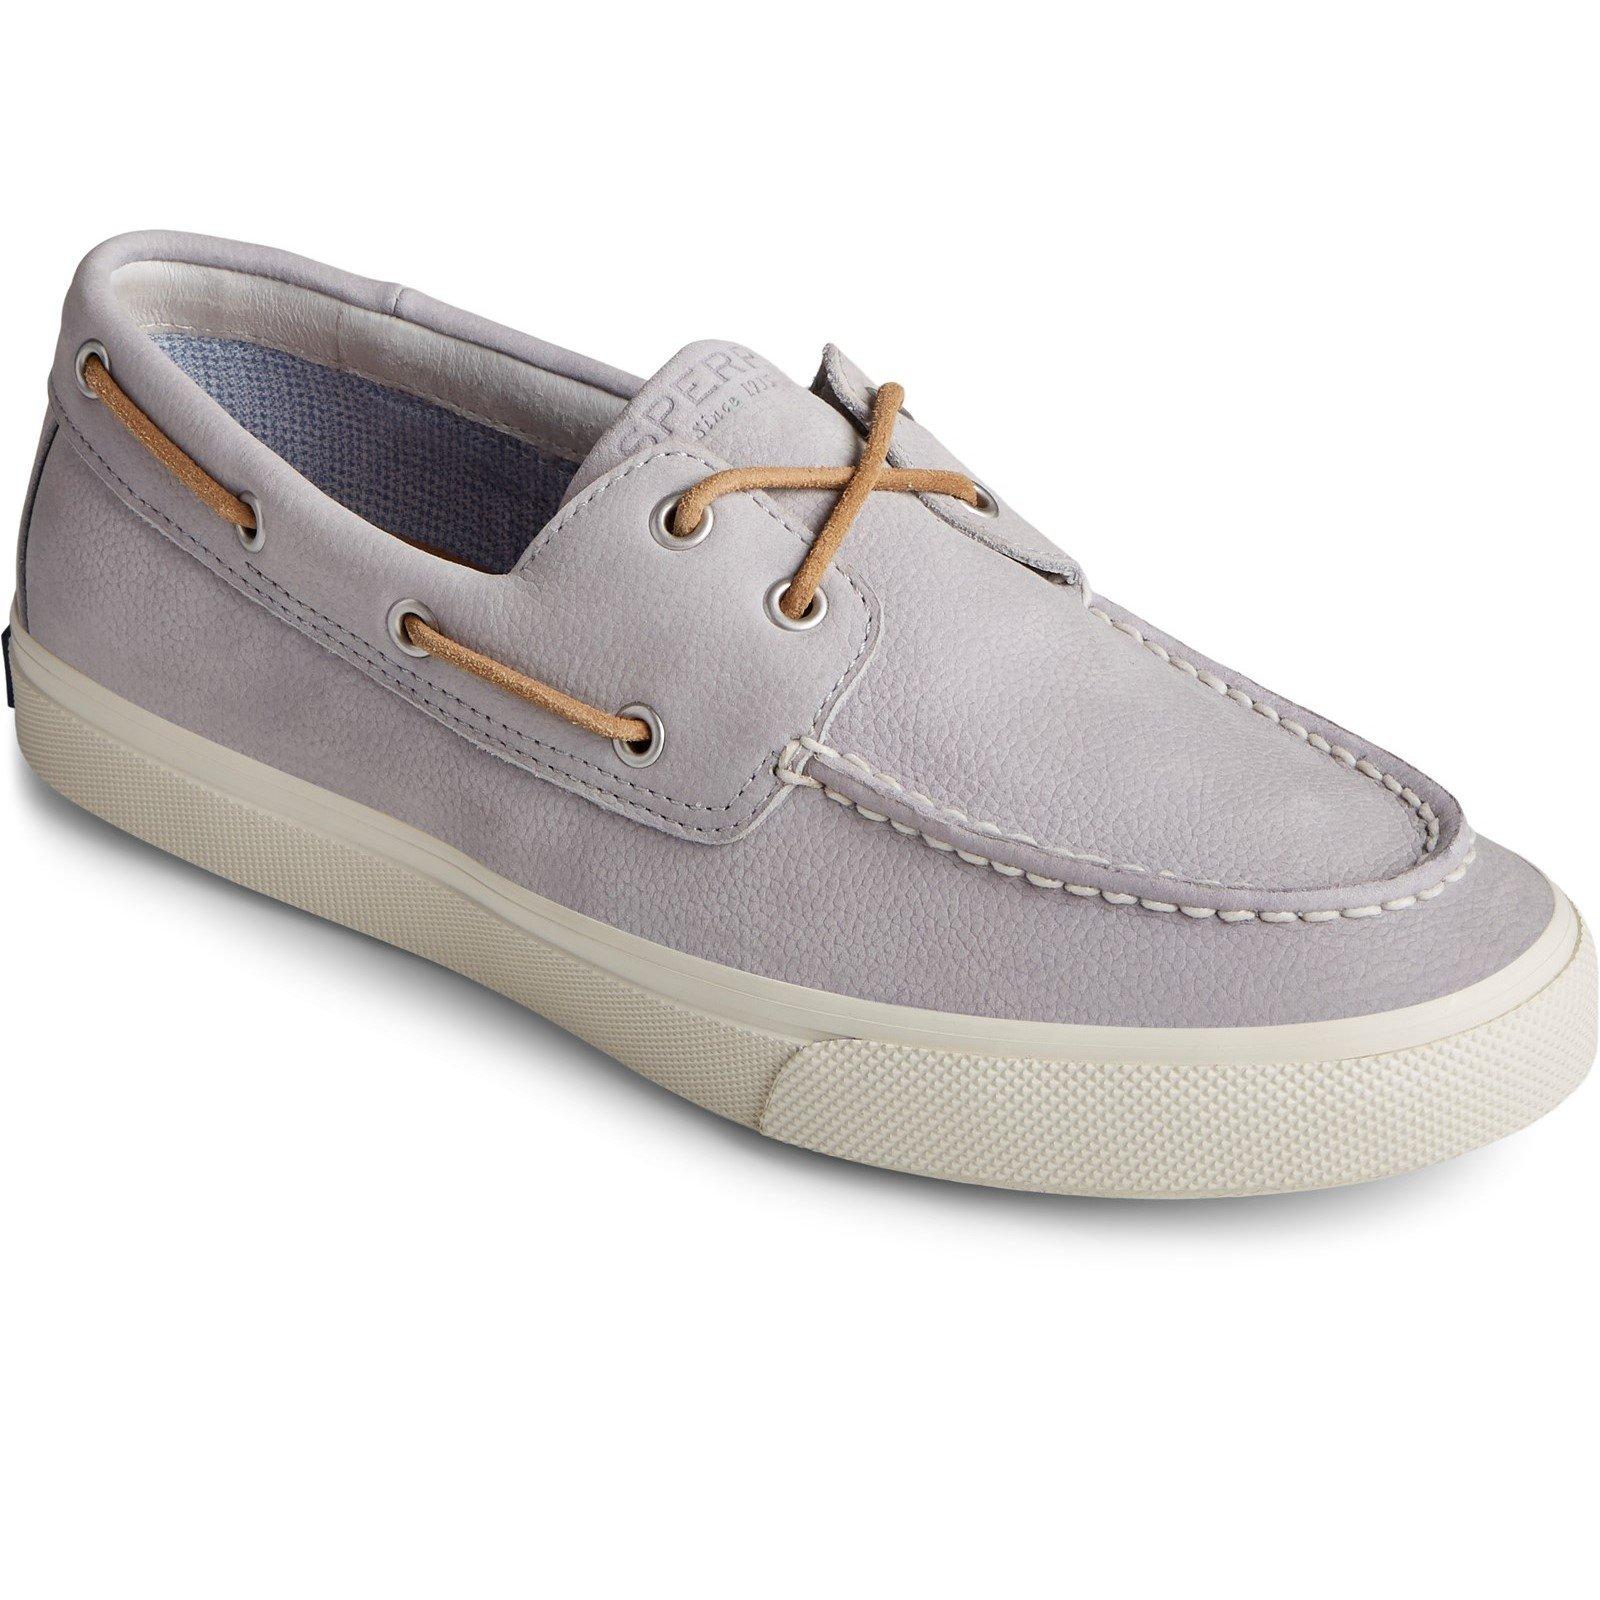 Sperry Men's Bahama Plushwave Boat Shoe Grey 32925 - Grey 12